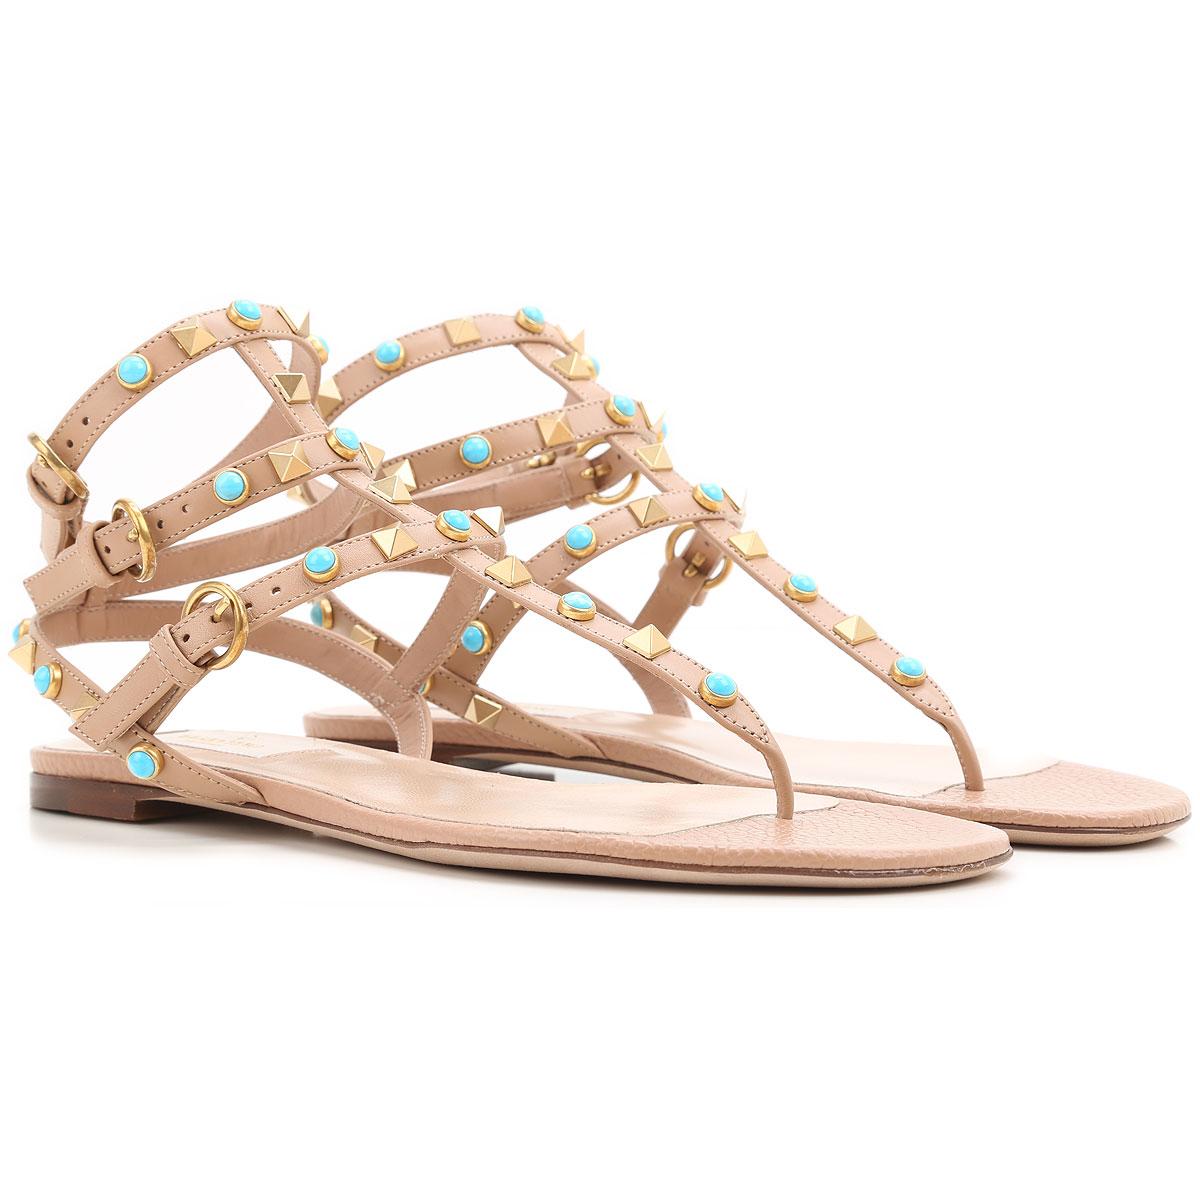 Womens Shoes Valentino Garavani Style code kw0s0812 vg4 n33